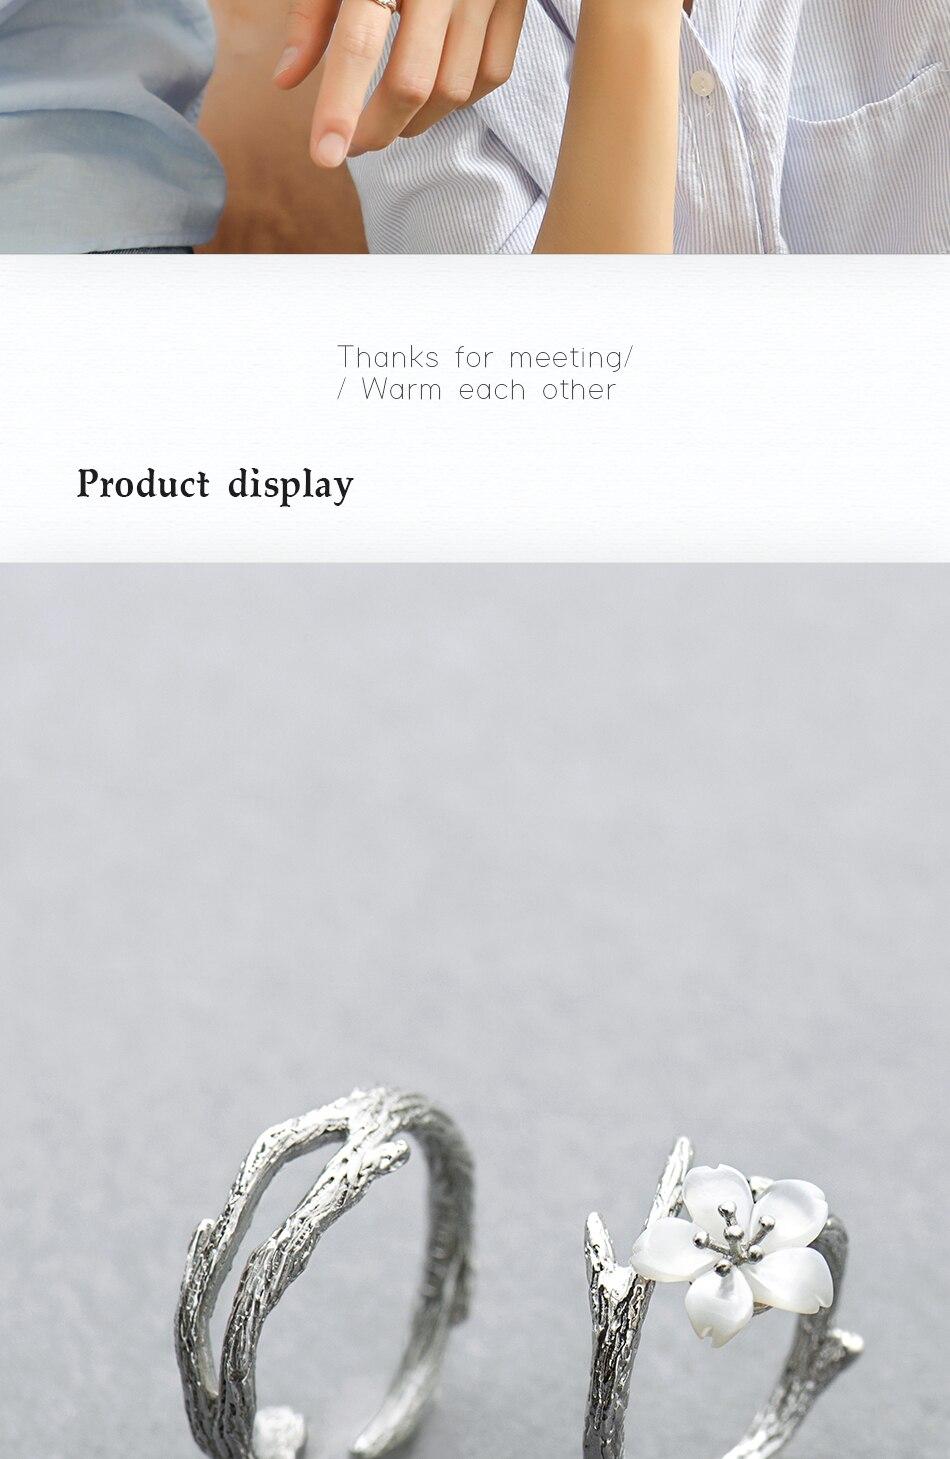 HTB1Te1BKk9WBuNjSspeq6yz5VXat Thaya White Cherry Blossom Silver Ring s925 Silver Natural Pearl Shell Flower Branch Rings for Women Elegant Ladies Jewelry